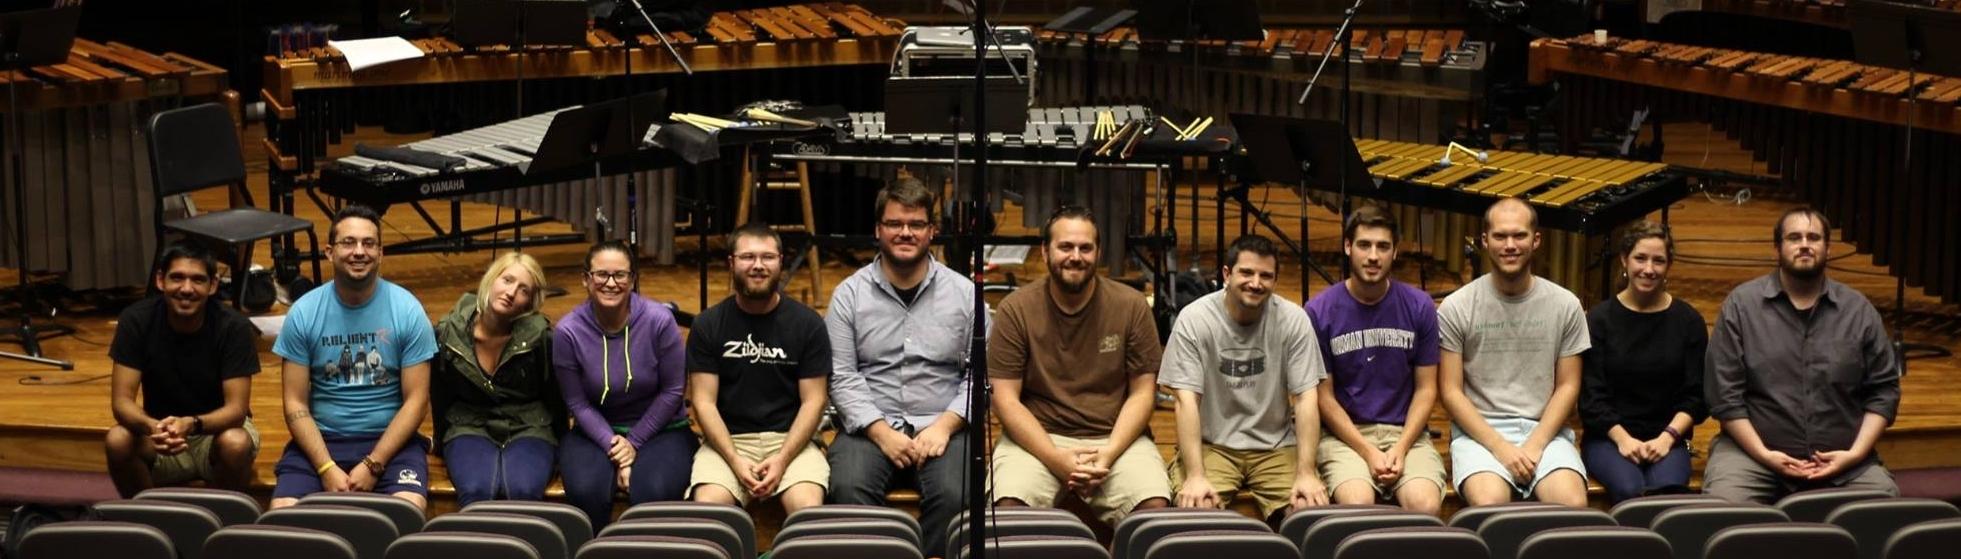 JP3 group photo.jpg